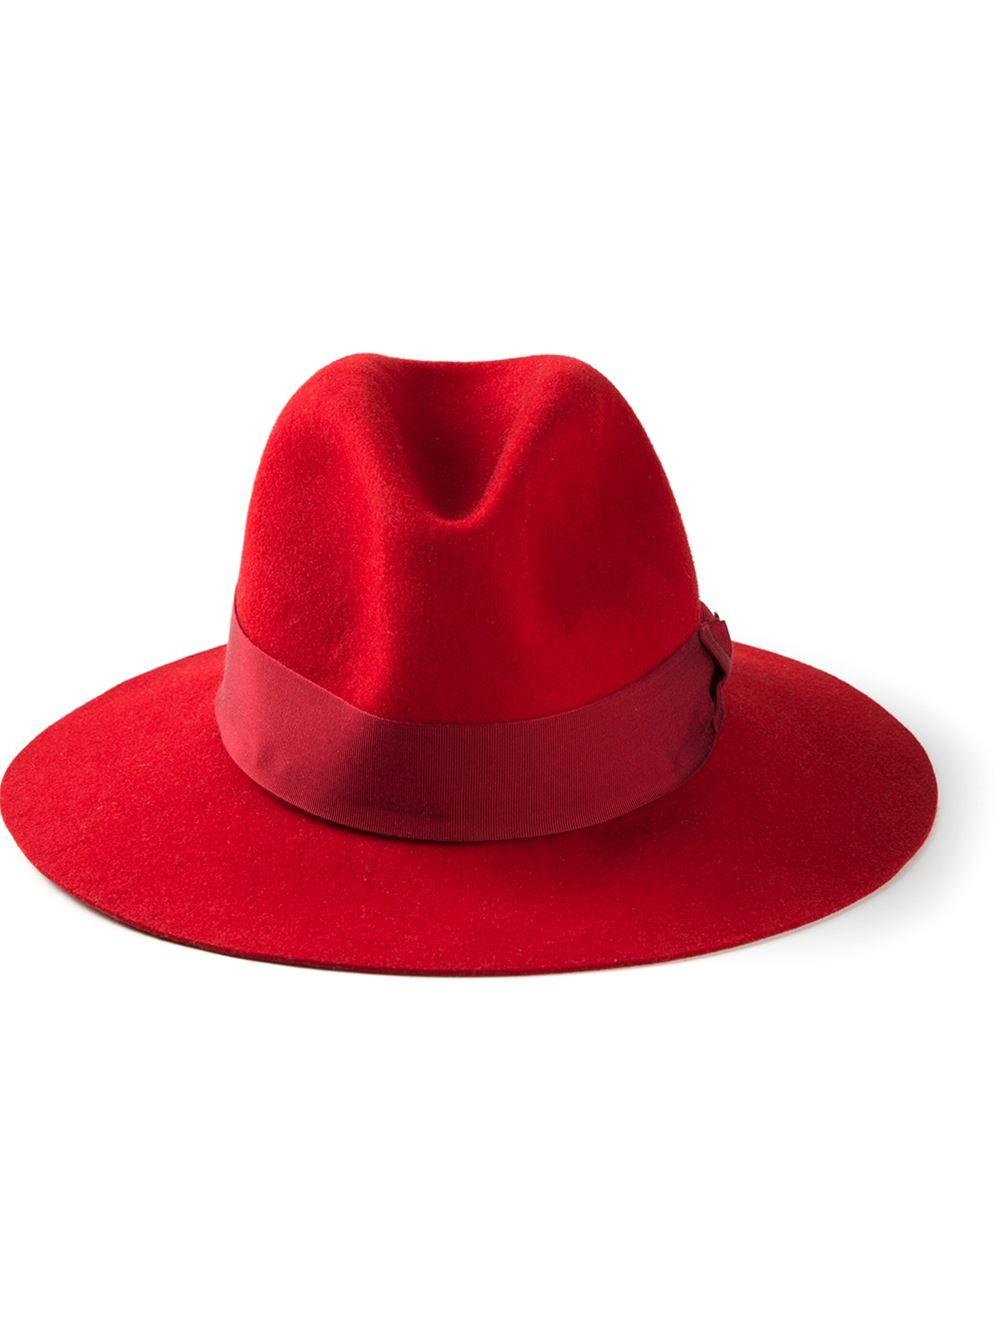 385c2cc53e5 Emilio Pucci Logo Detail Fedora Hat in Red - Lyst